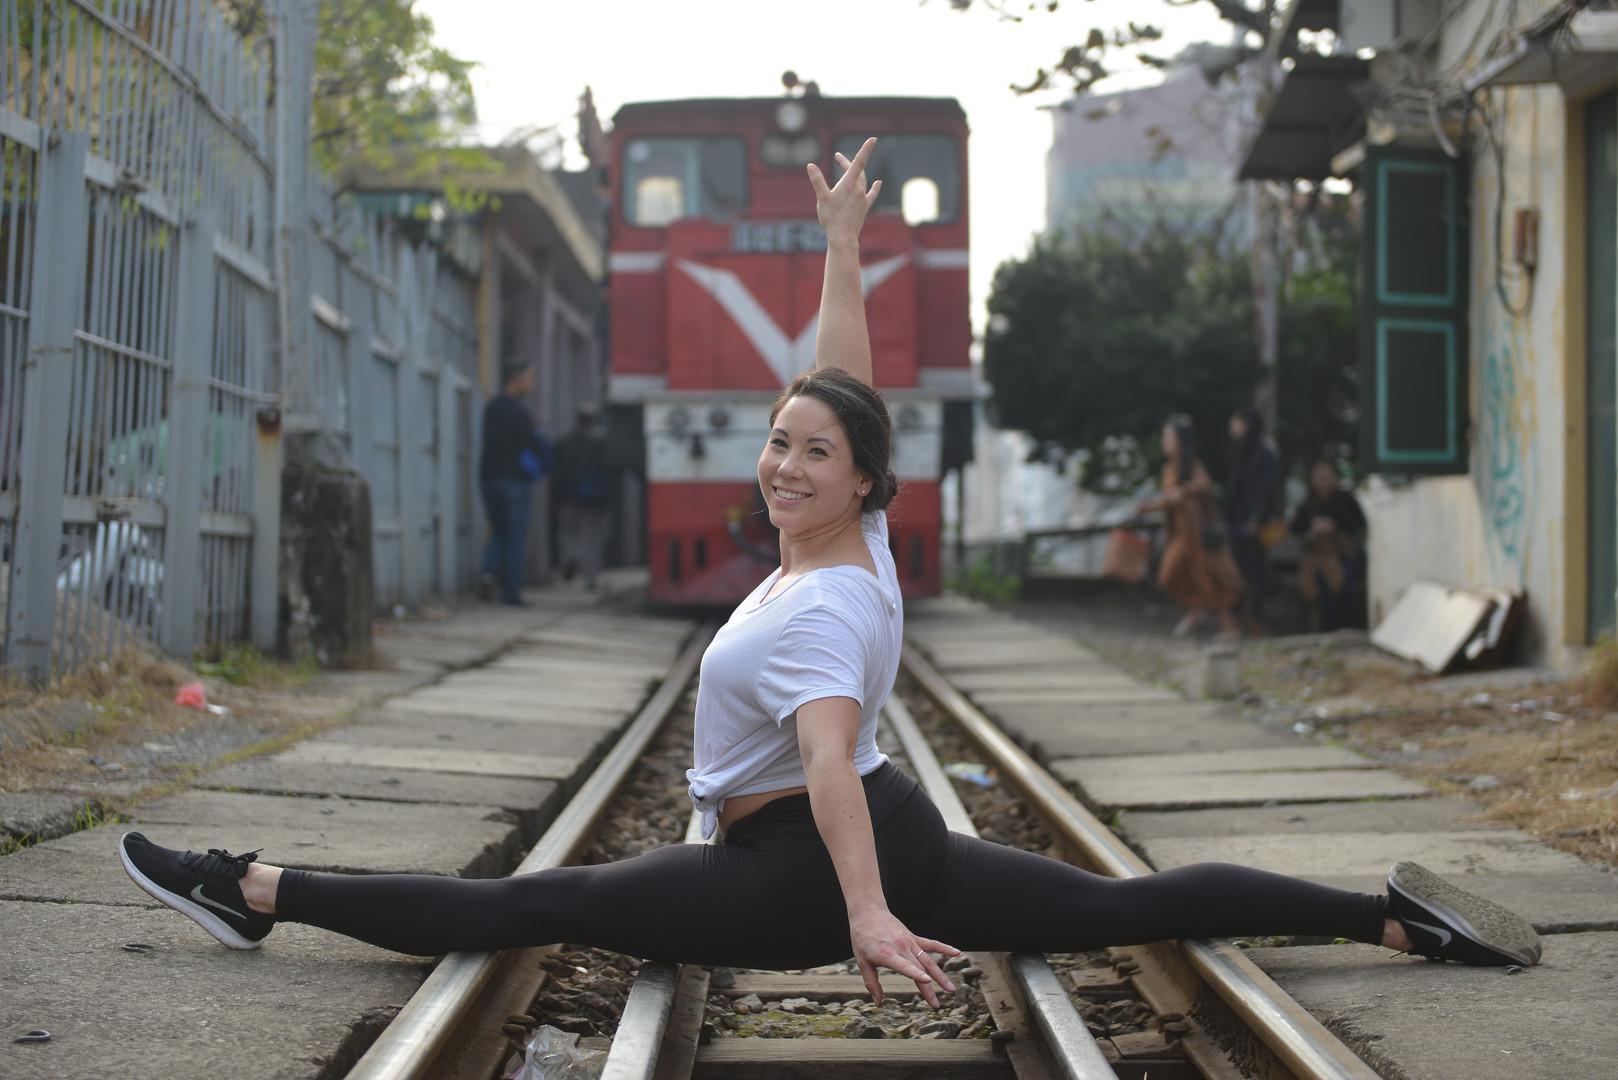 Photo credit: Hoa Tran